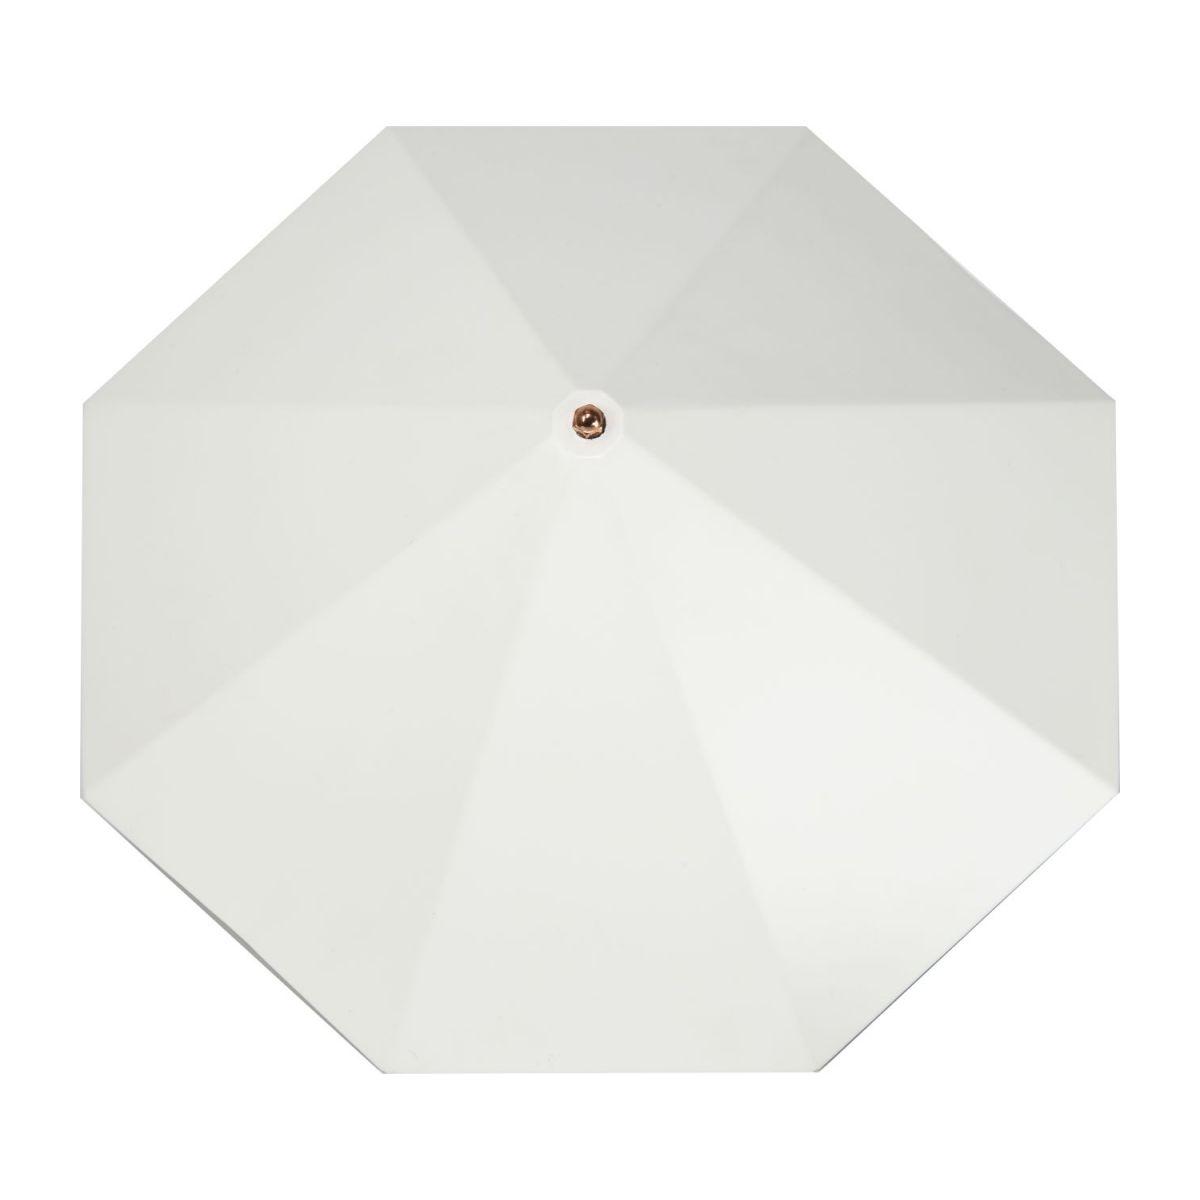 Parasol Blanc Habitat Lampes Métal Table De 8n0OXZNkwP